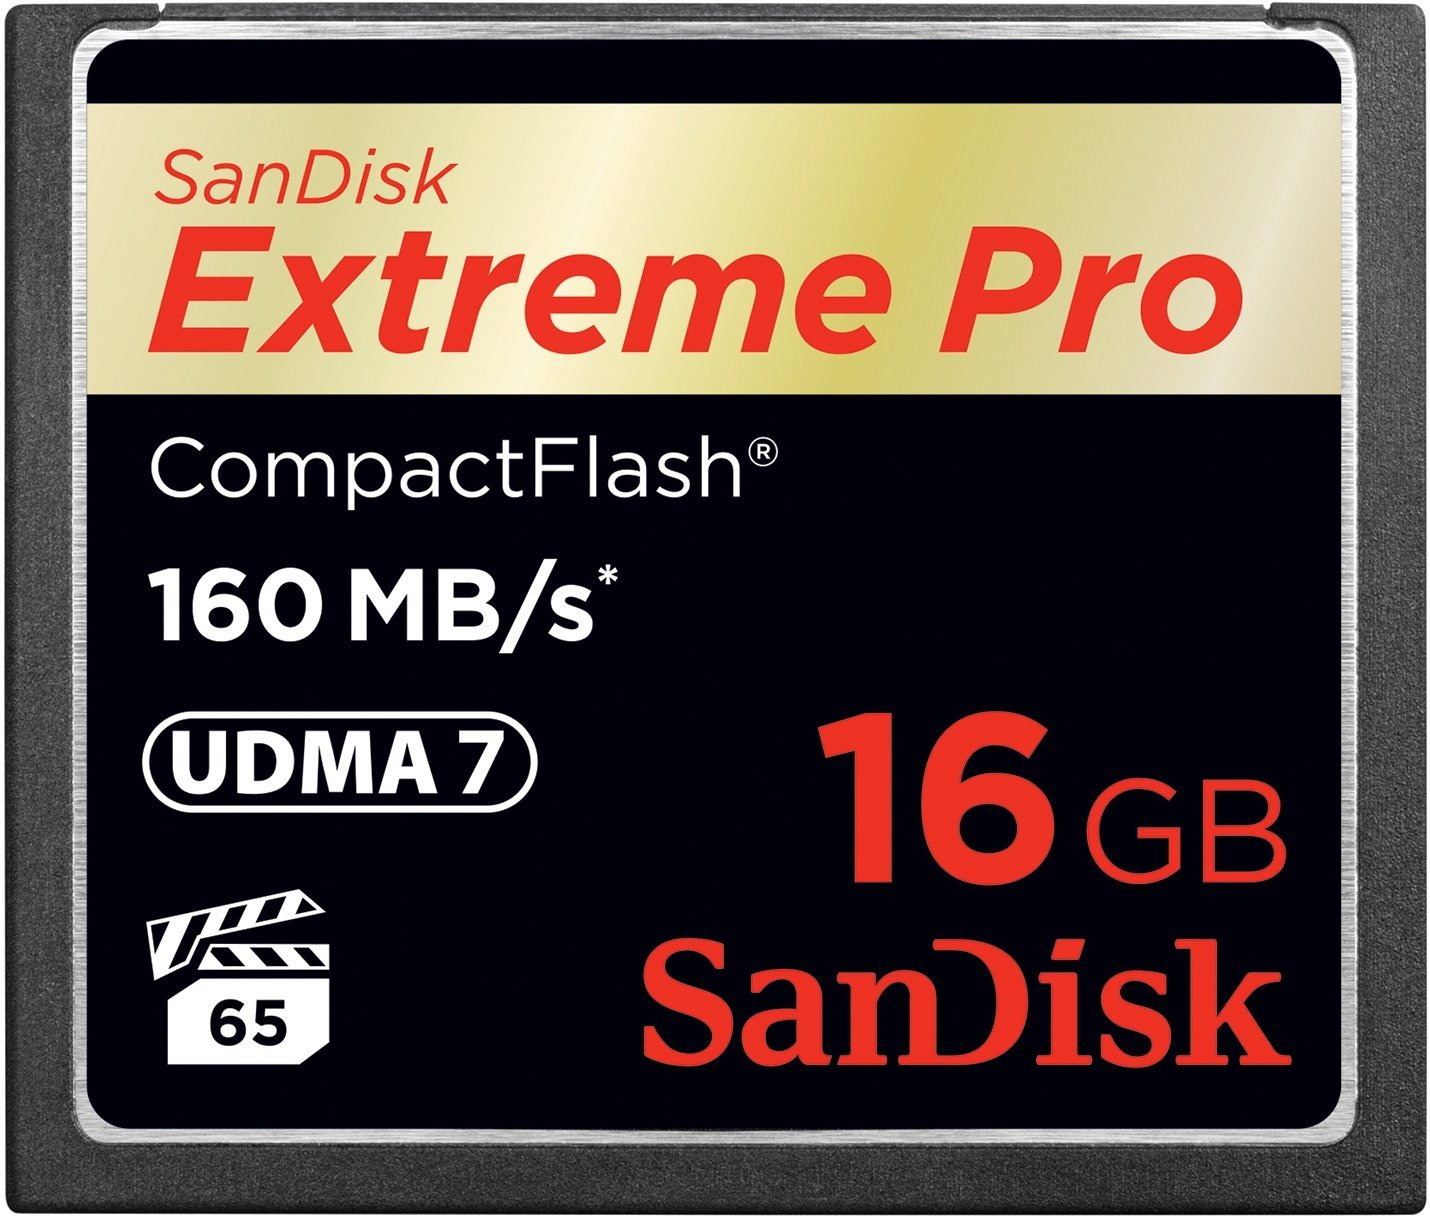 Sandisk Extreme Pro Compact Flash (CF) Memory Card  16GB  160MBs UDMA 7